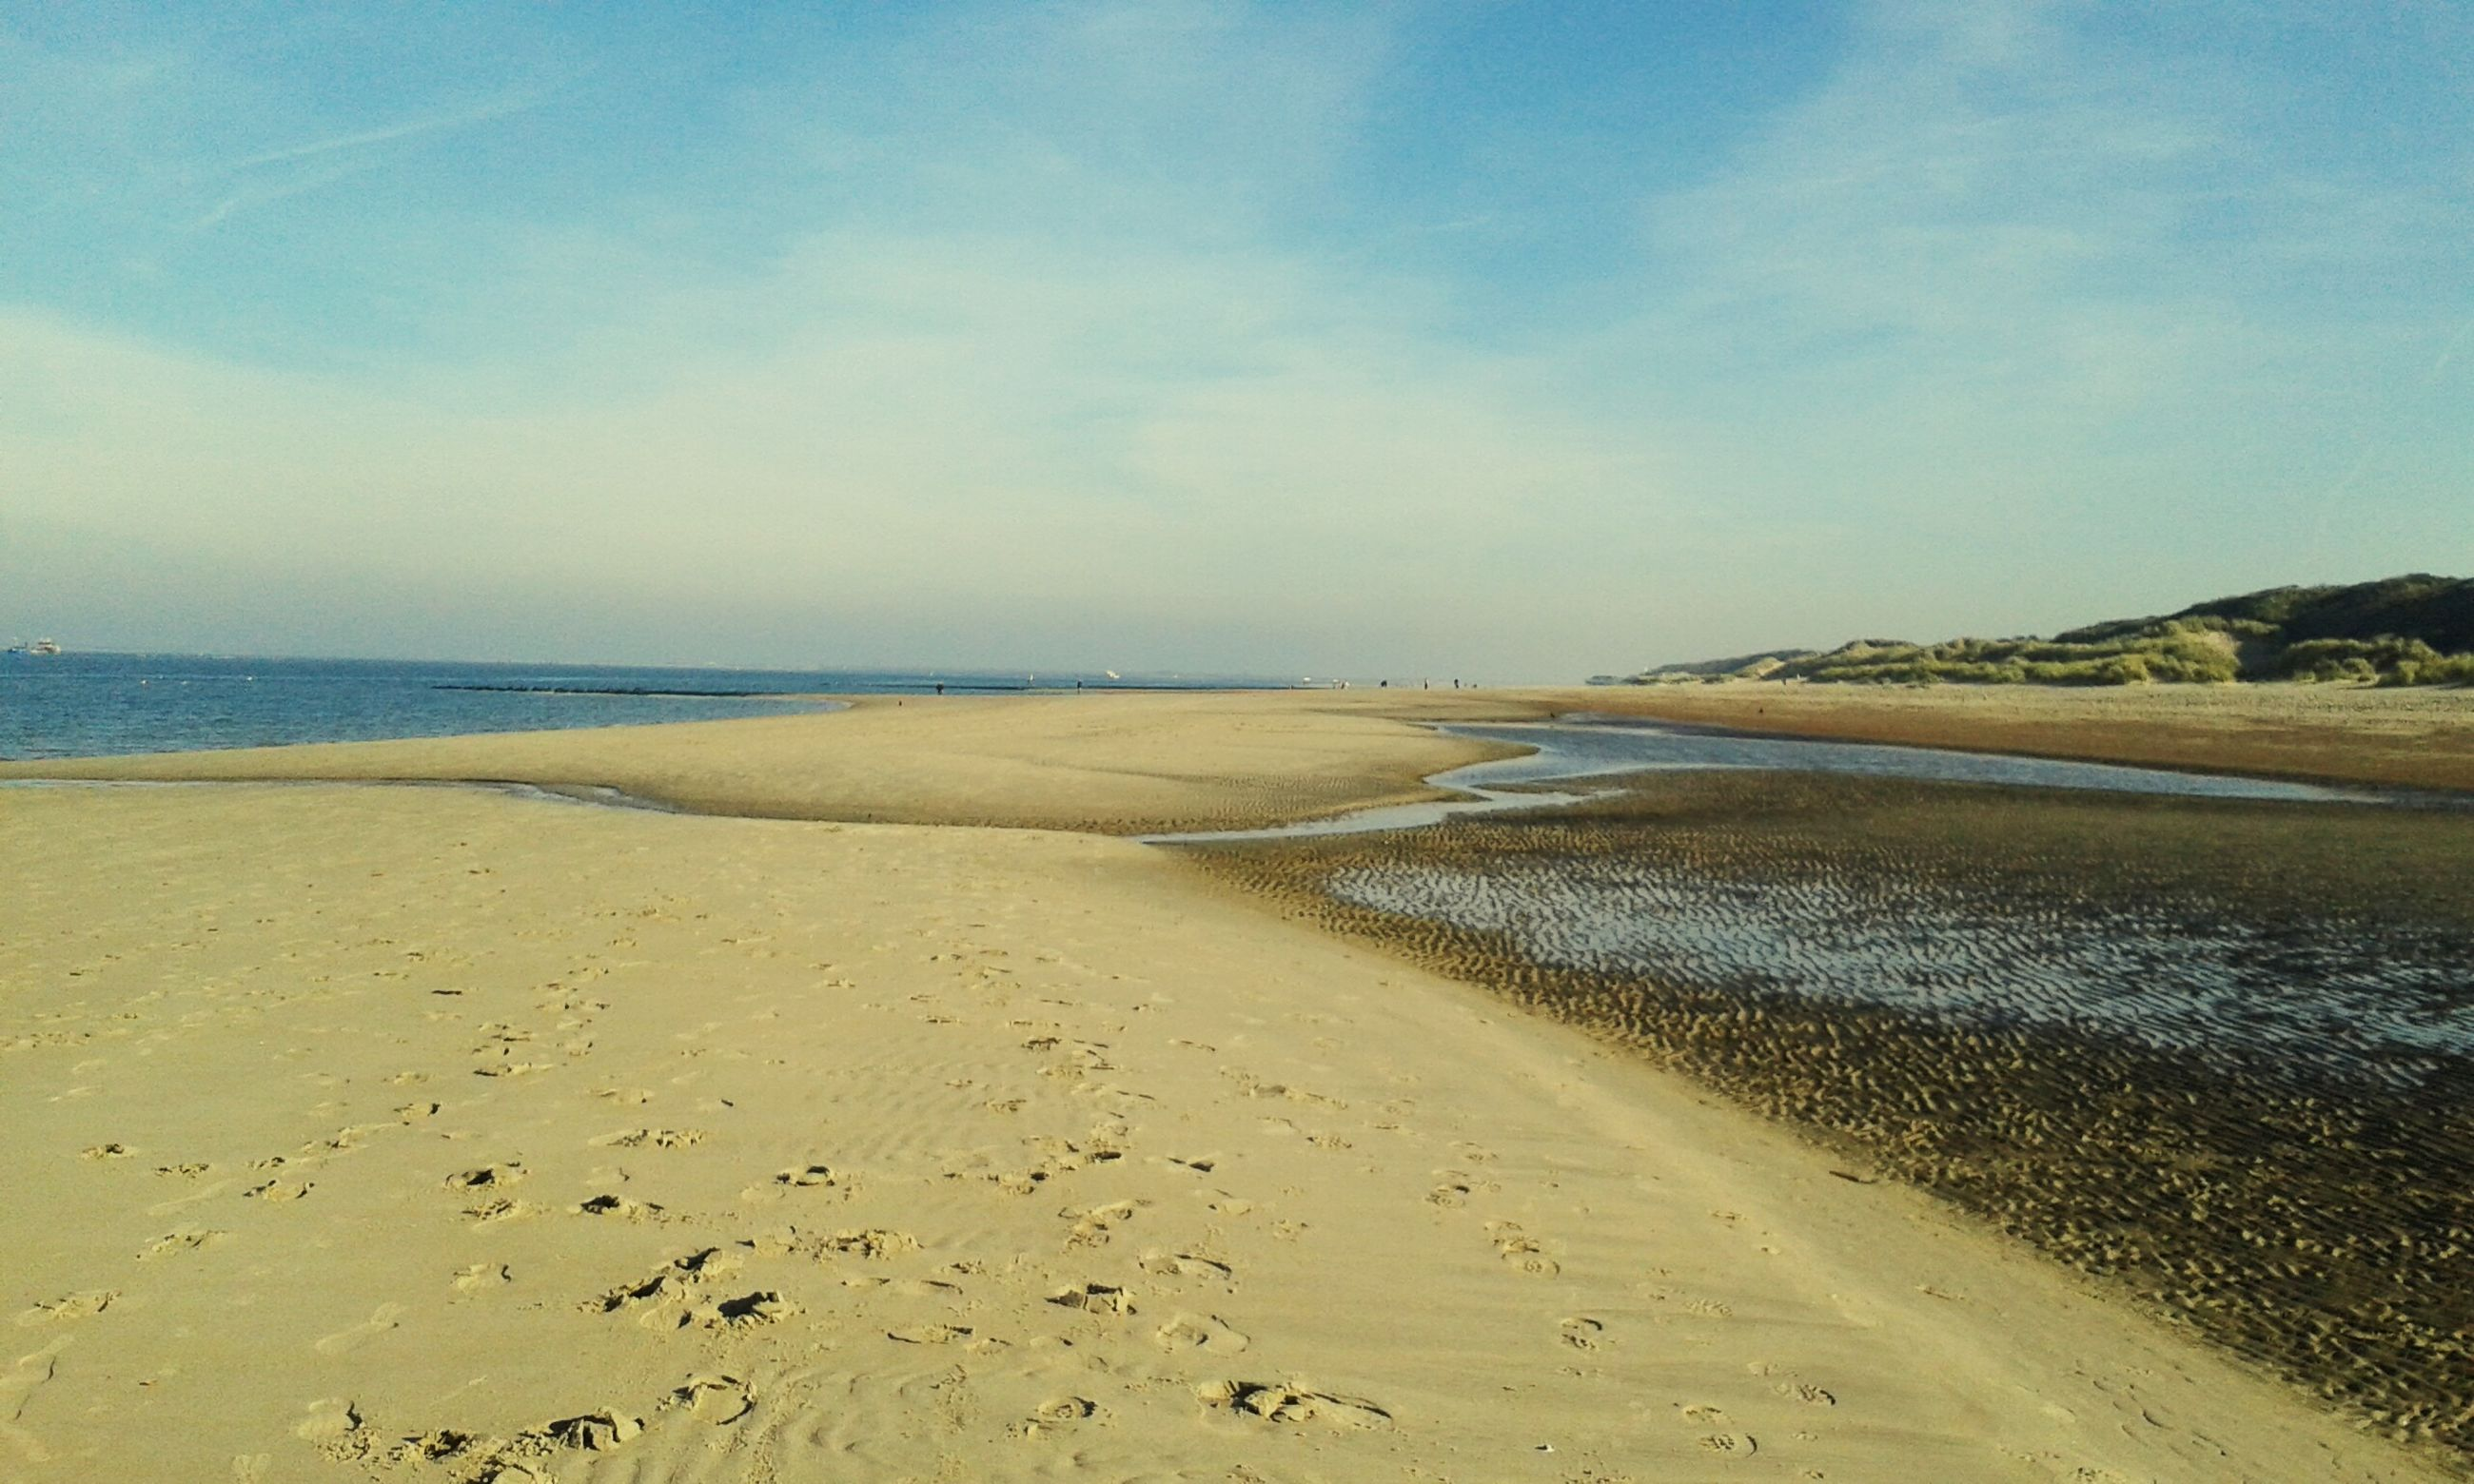 beach, sand, water, sea, tranquil scene, shore, tranquility, scenics, sky, beauty in nature, nature, horizon over water, coastline, idyllic, blue, outdoors, calm, day, remote, non-urban scene